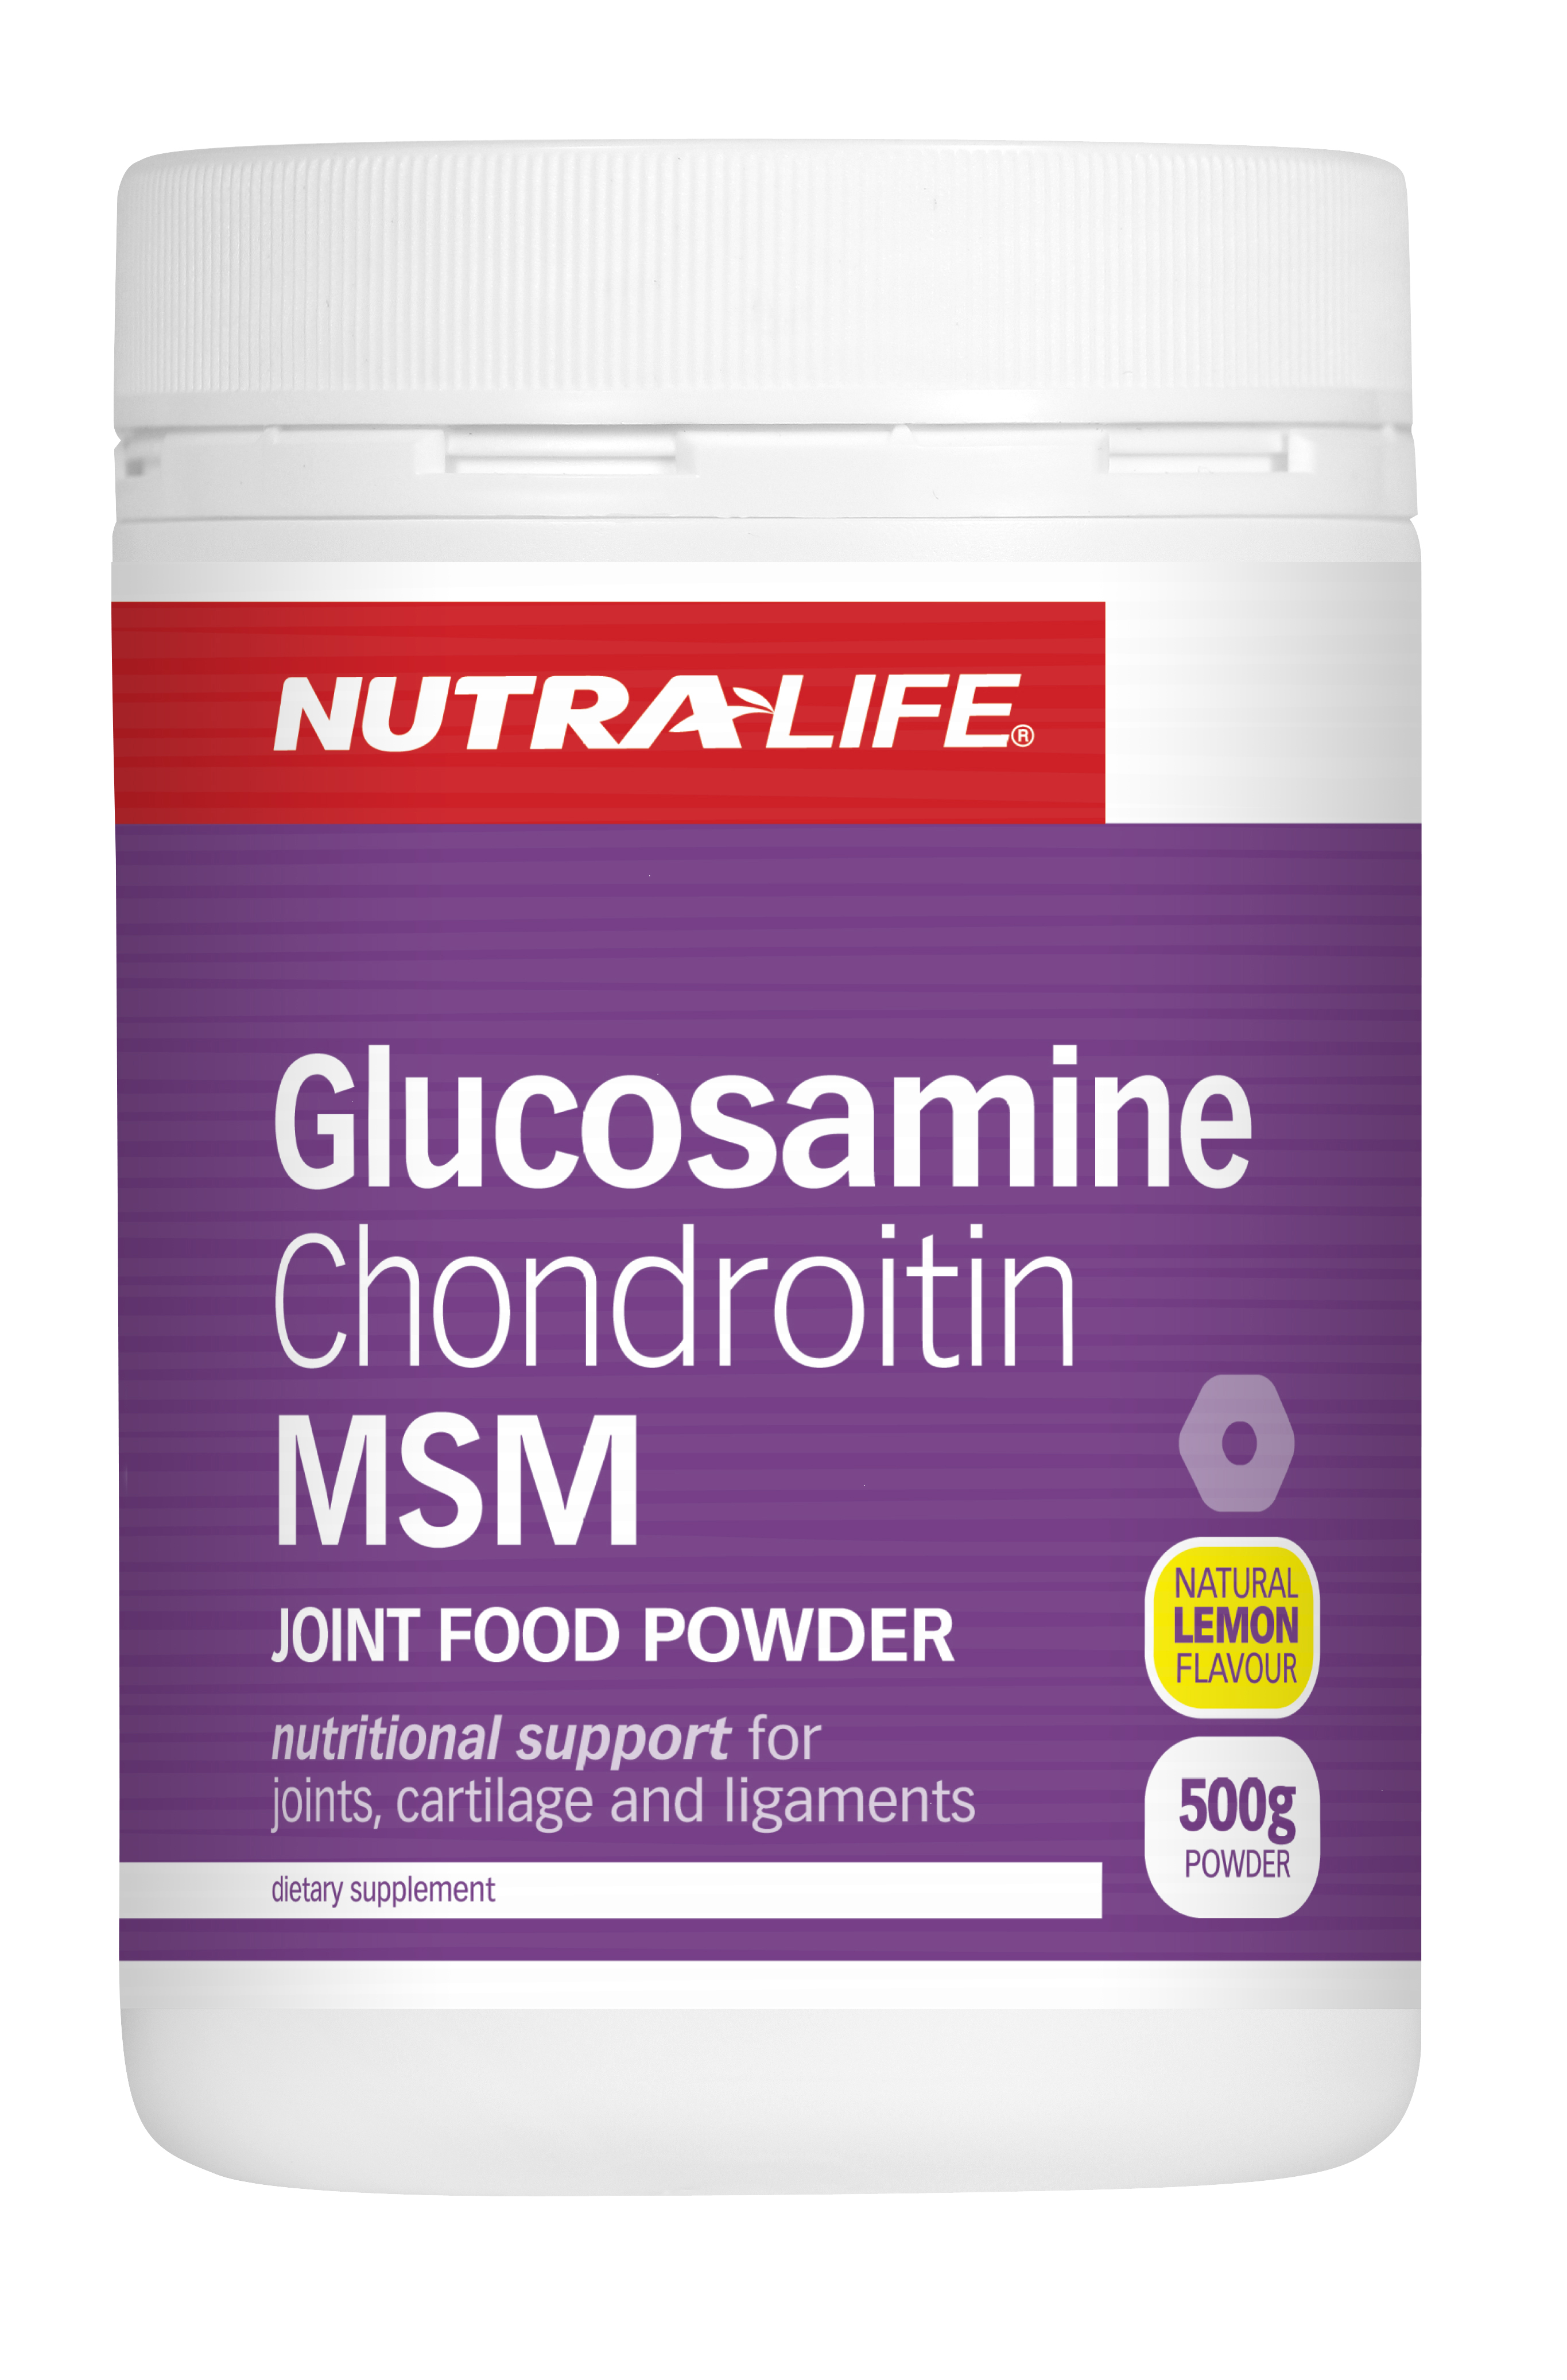 nutra-life-glucosamine-chondroitin-with-msm-lemon-500g